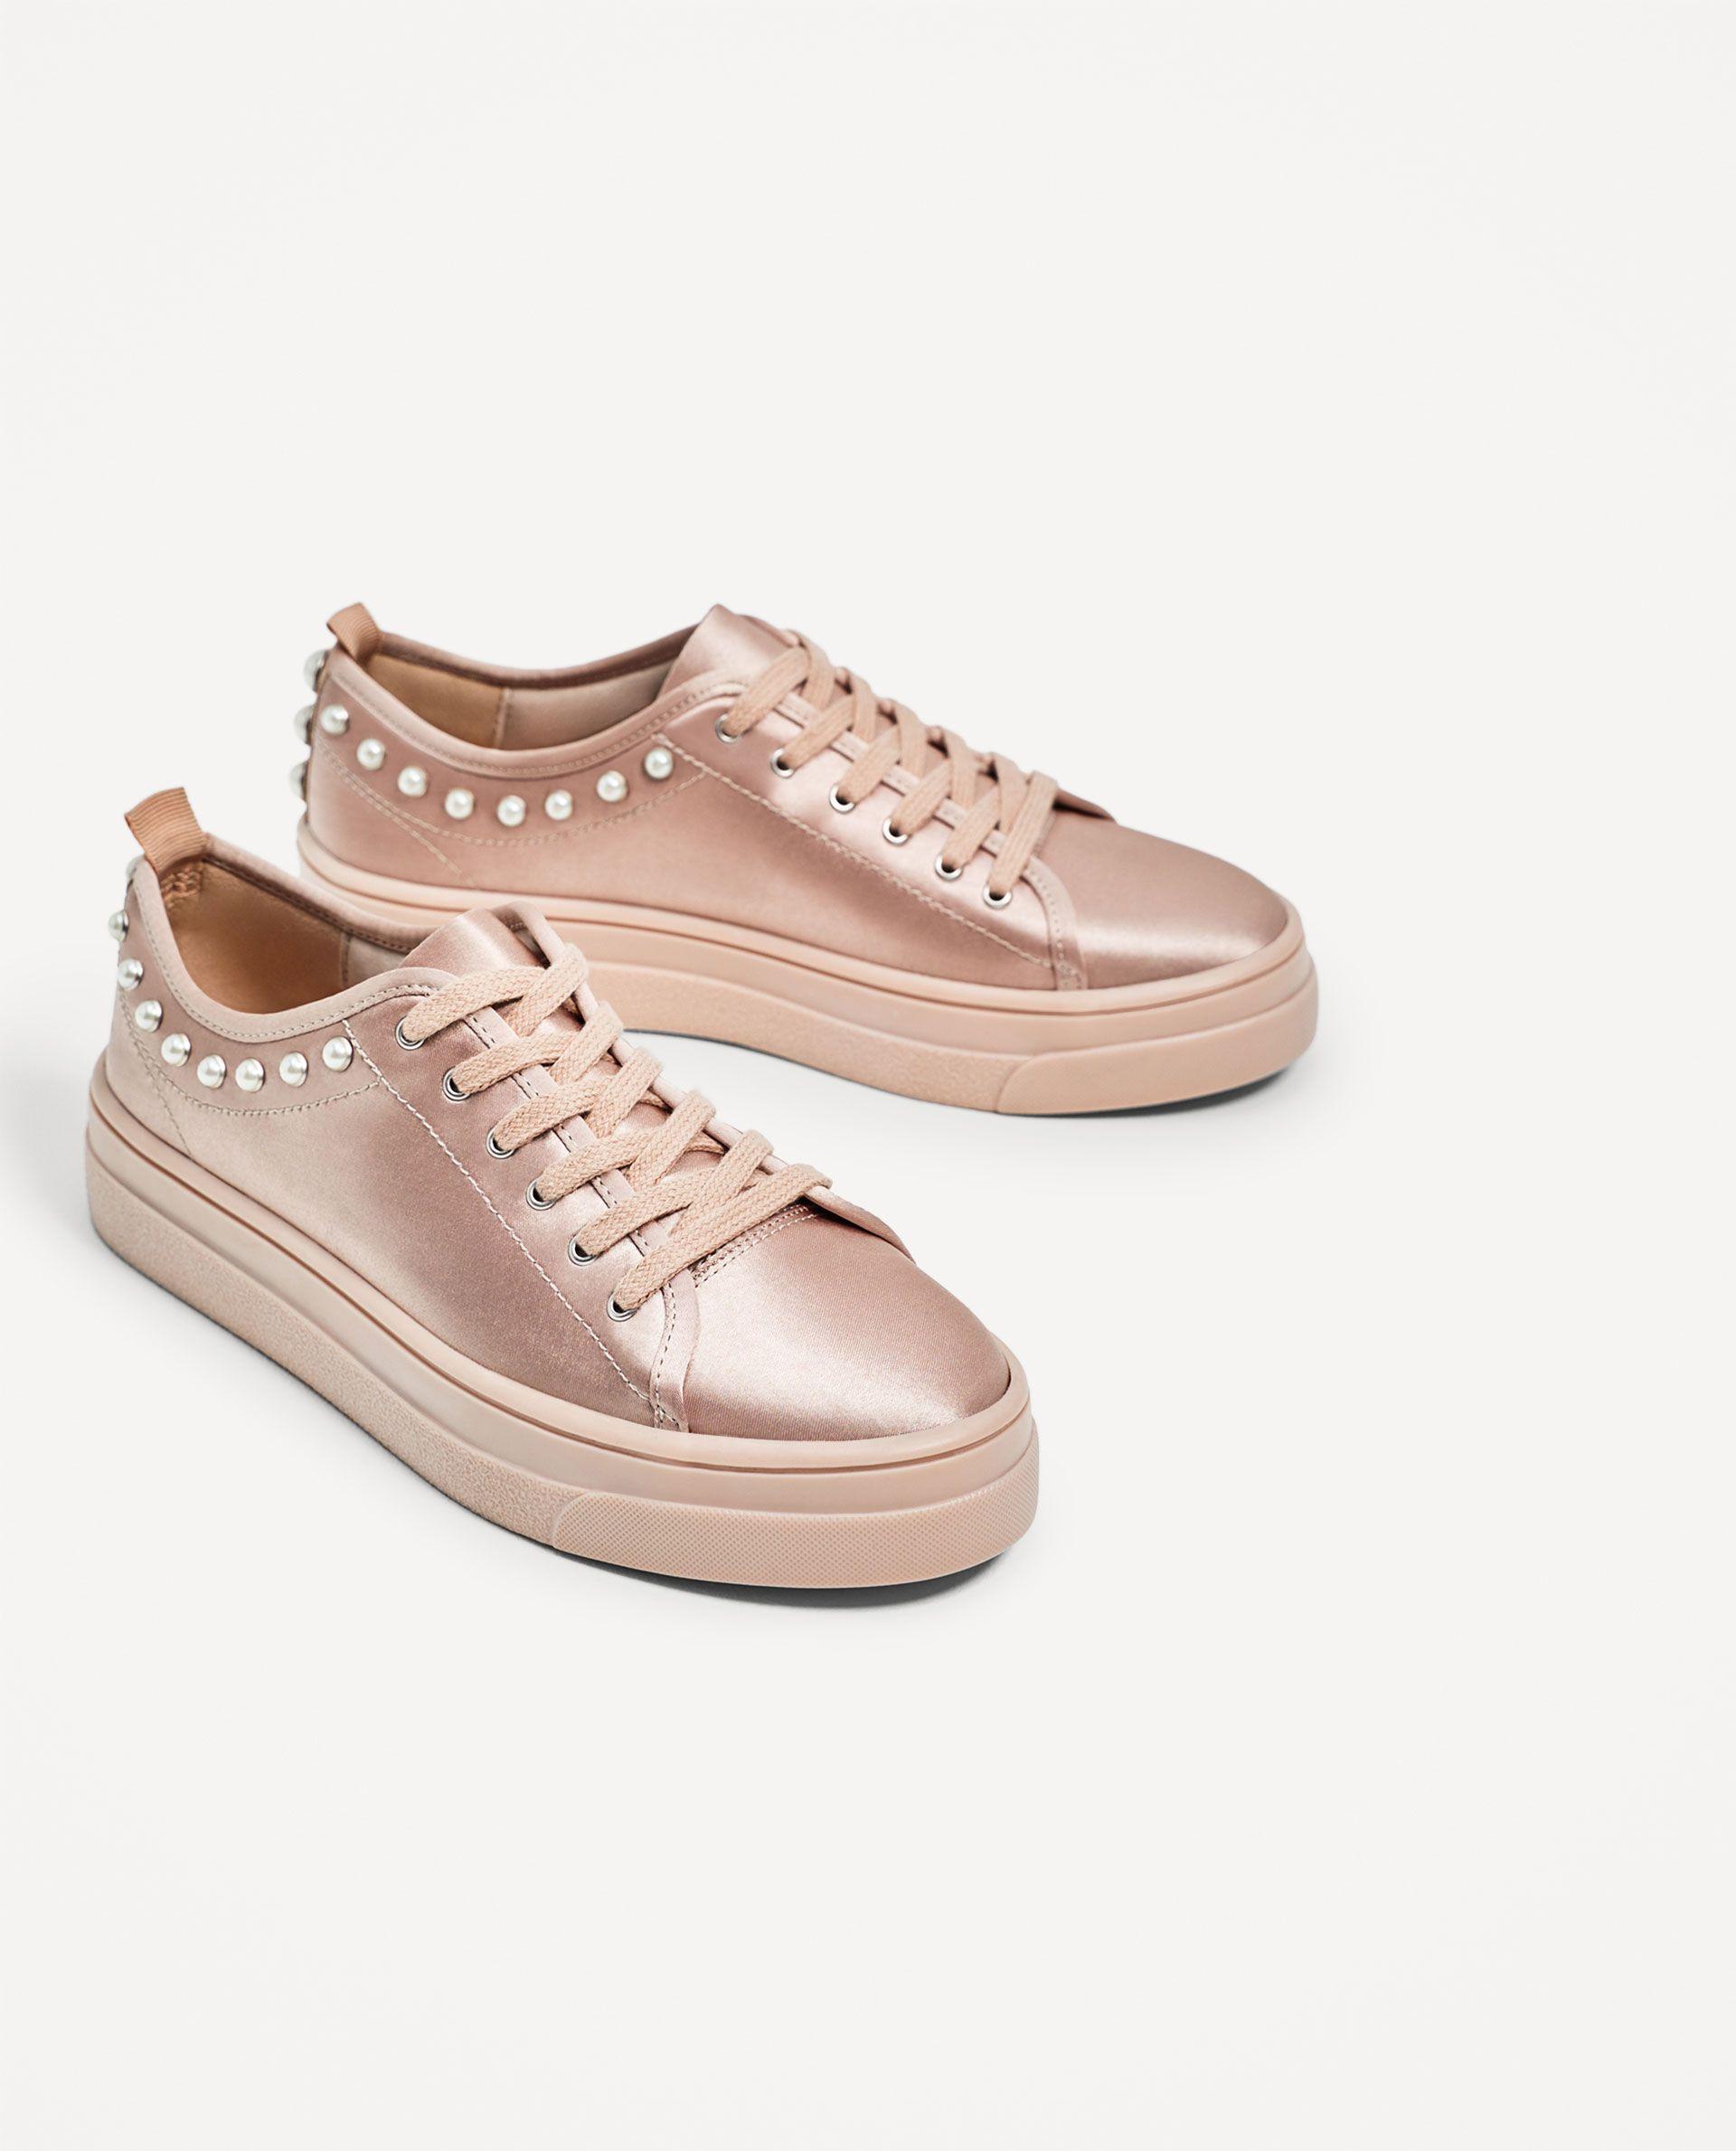 0231377a DEPORTIVO RASO PERLAS en 2019 | Dress to impress ✨ | Zapatos ...